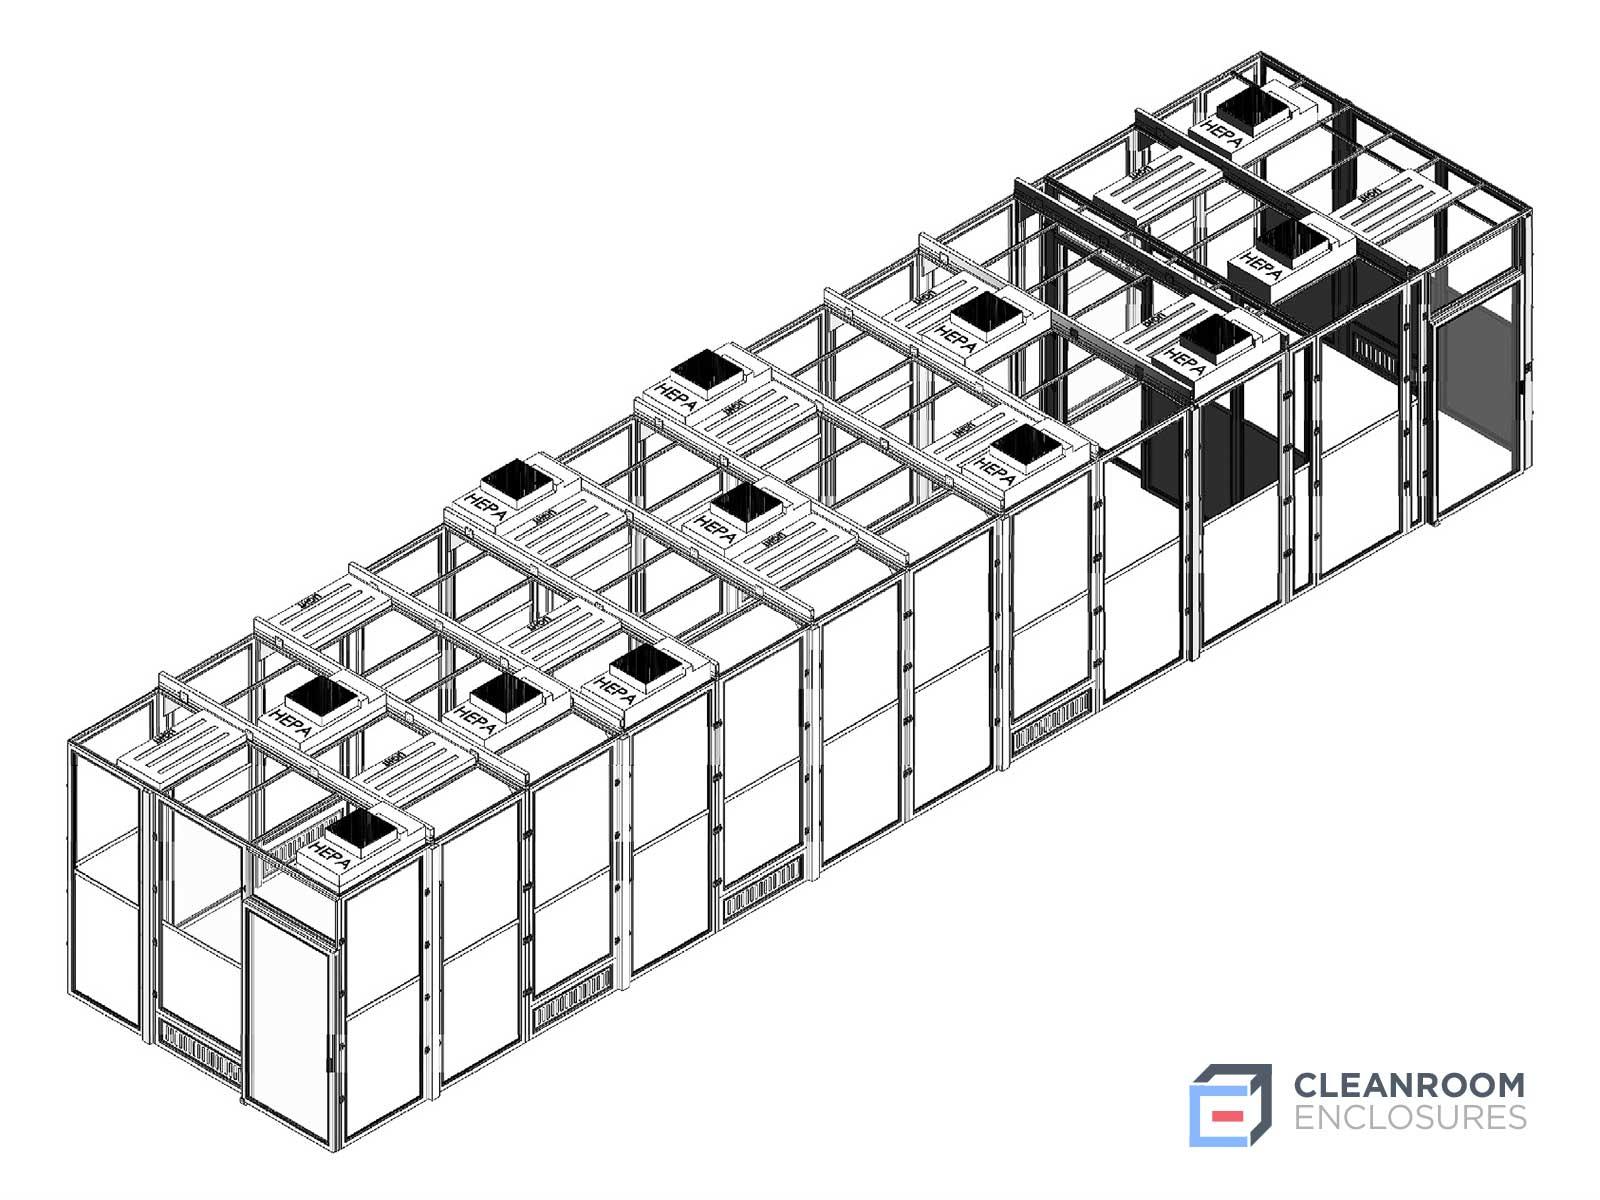 Horizontal Modular Cleanroom Diagram